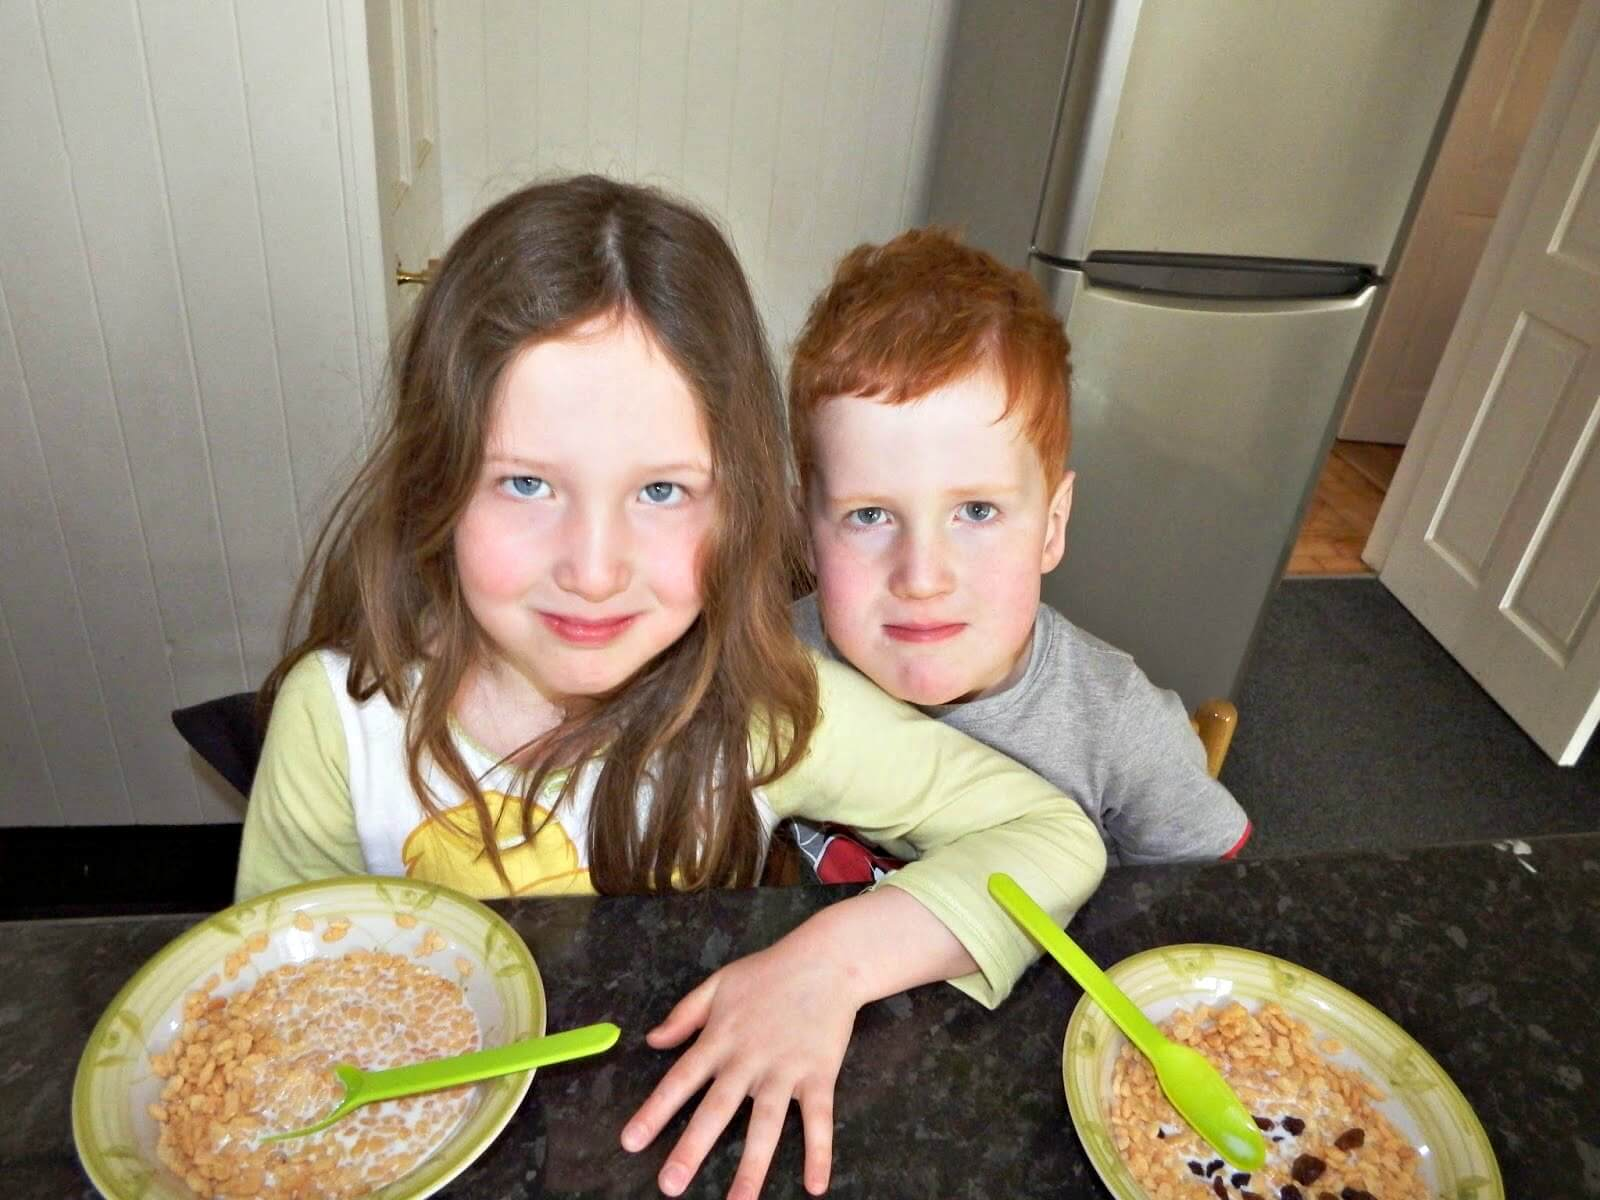 Use your freezer to save money - Caitlin & Ieuan at breakfast